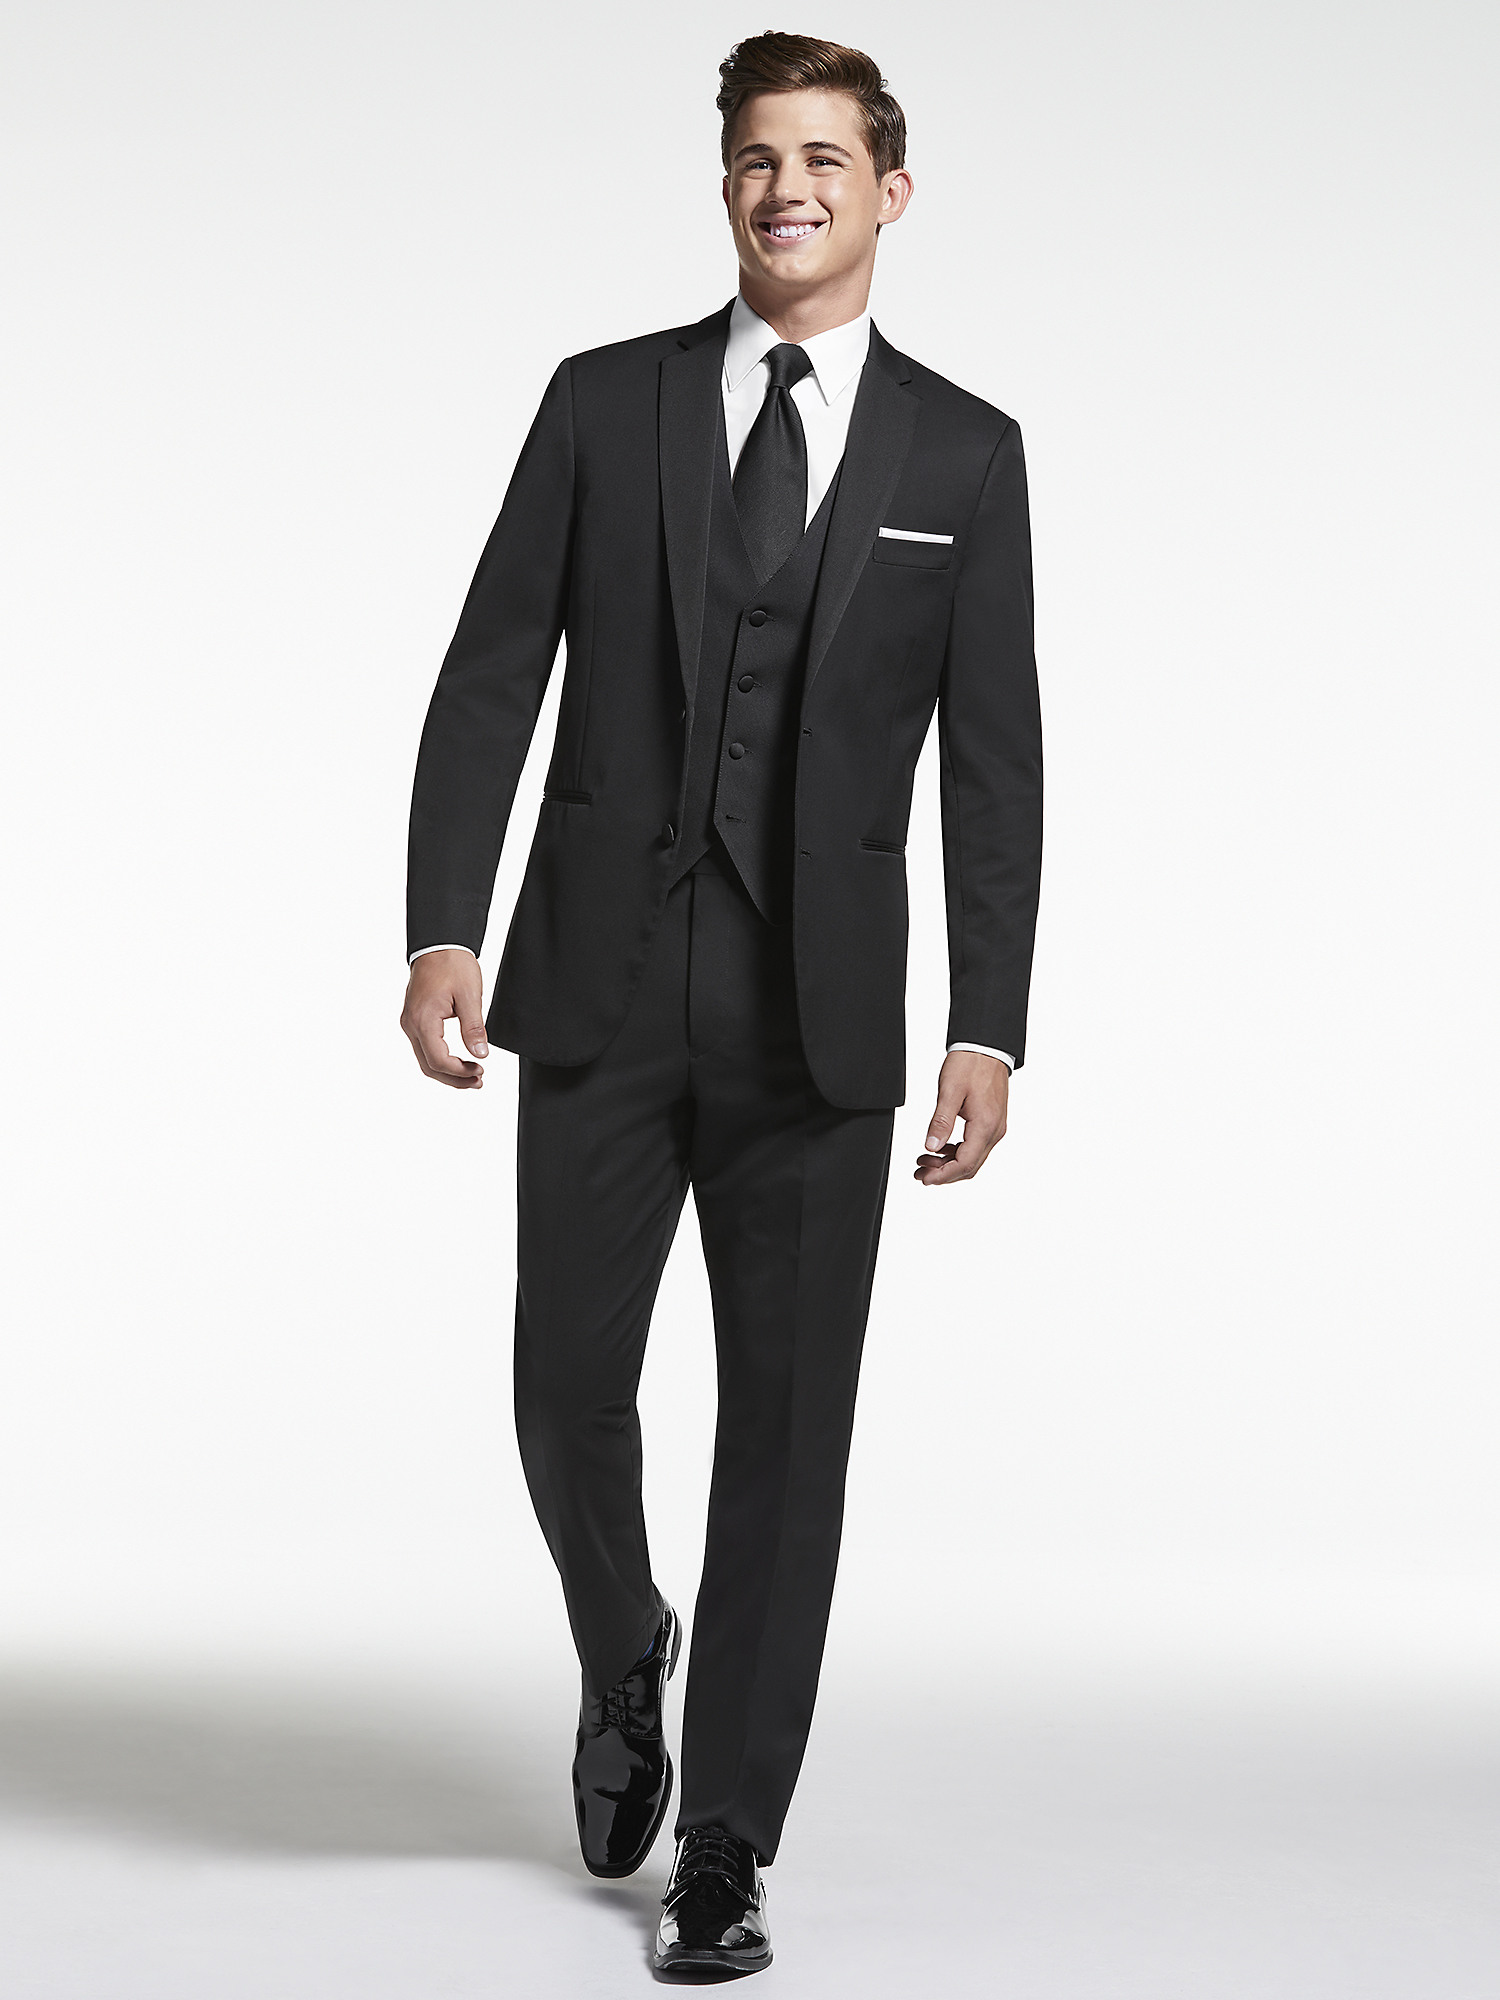 Black Tuxedo | BLACK b...